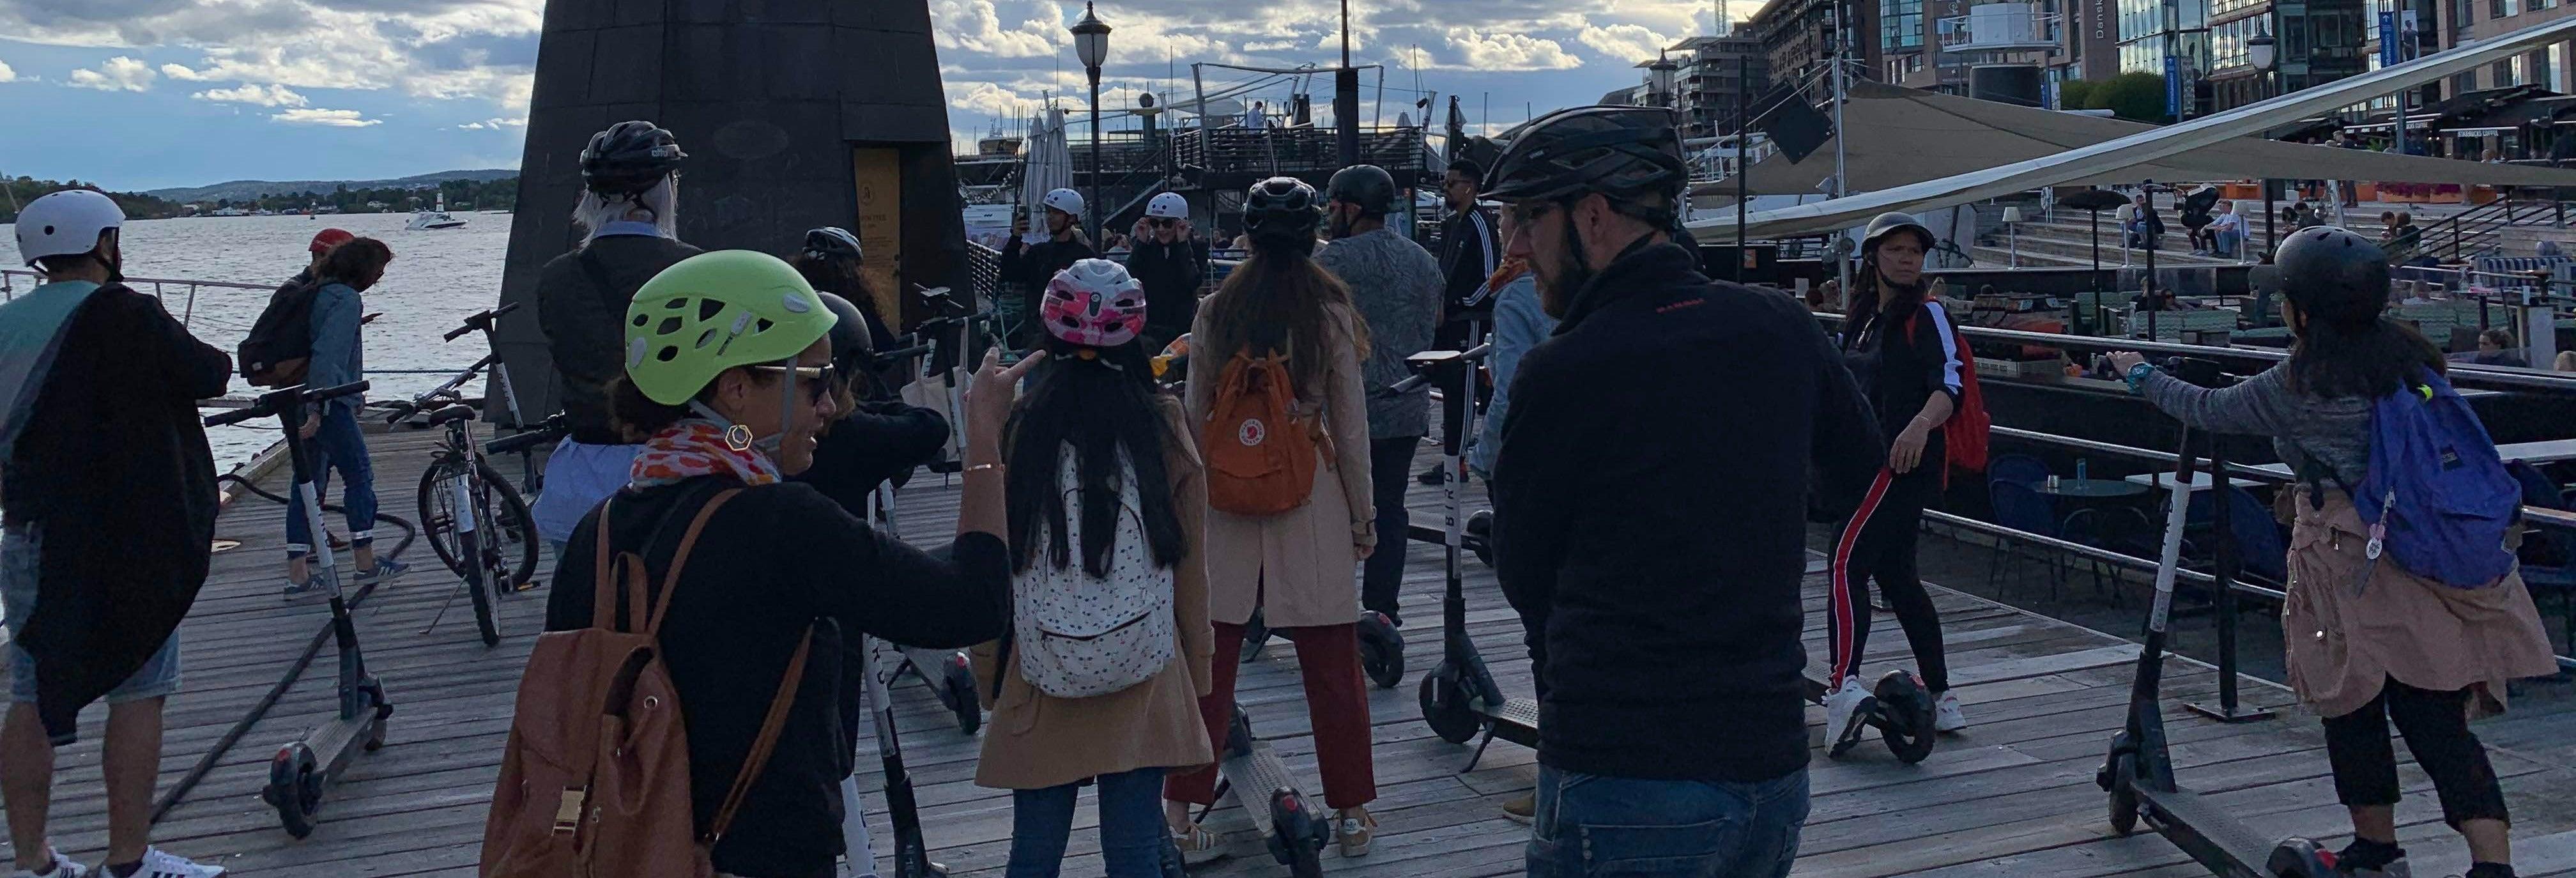 Tour de patinete elétrico por Oslo